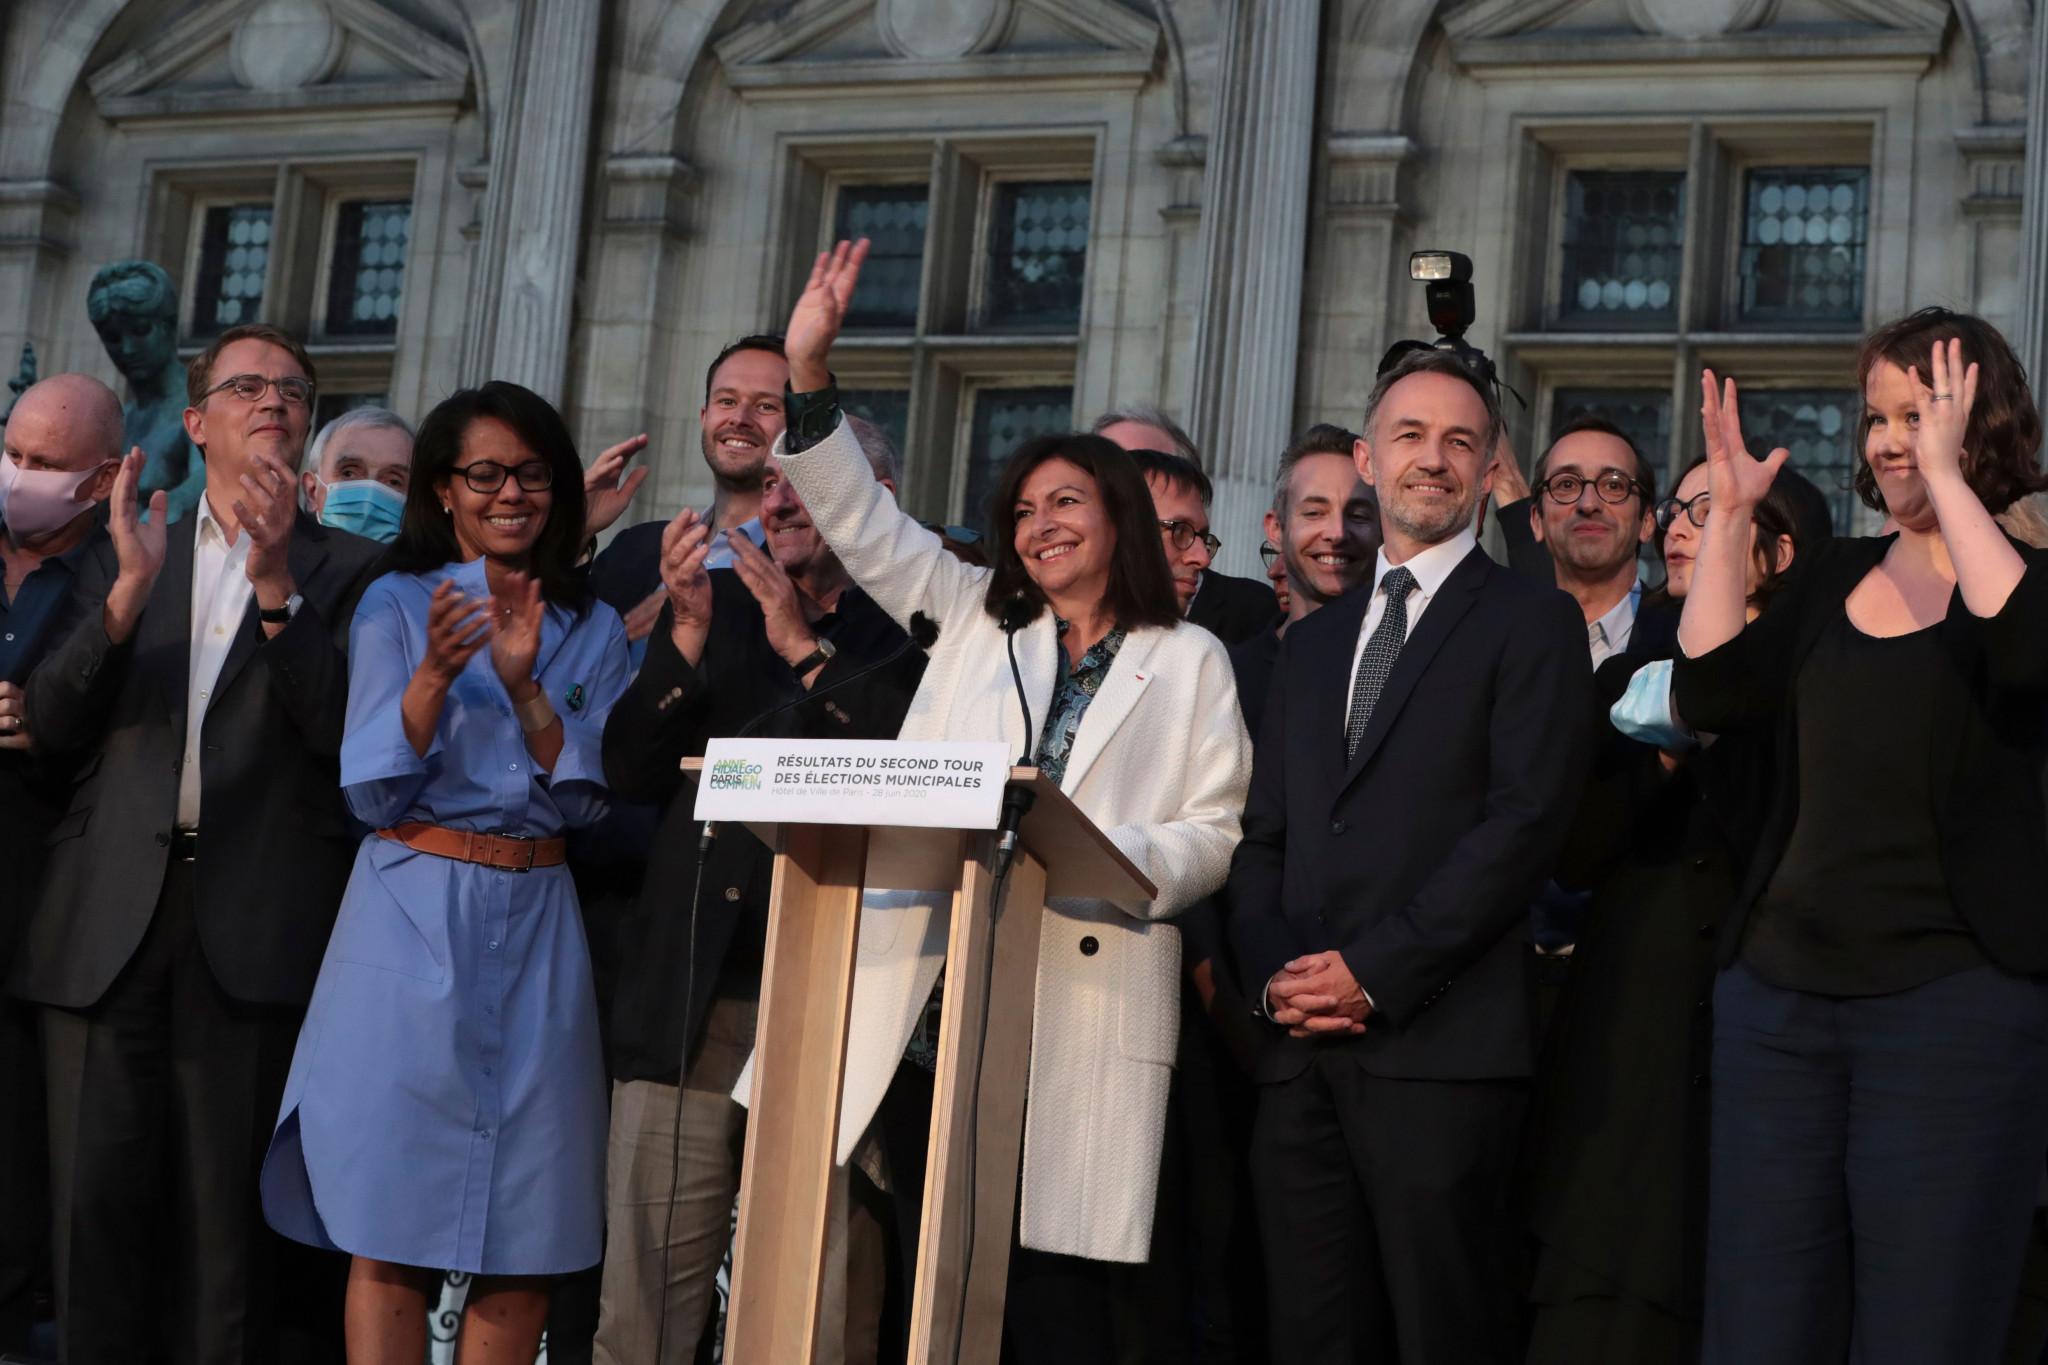 Hidalgo set to be Mayor for Paris 2024 following election triumph